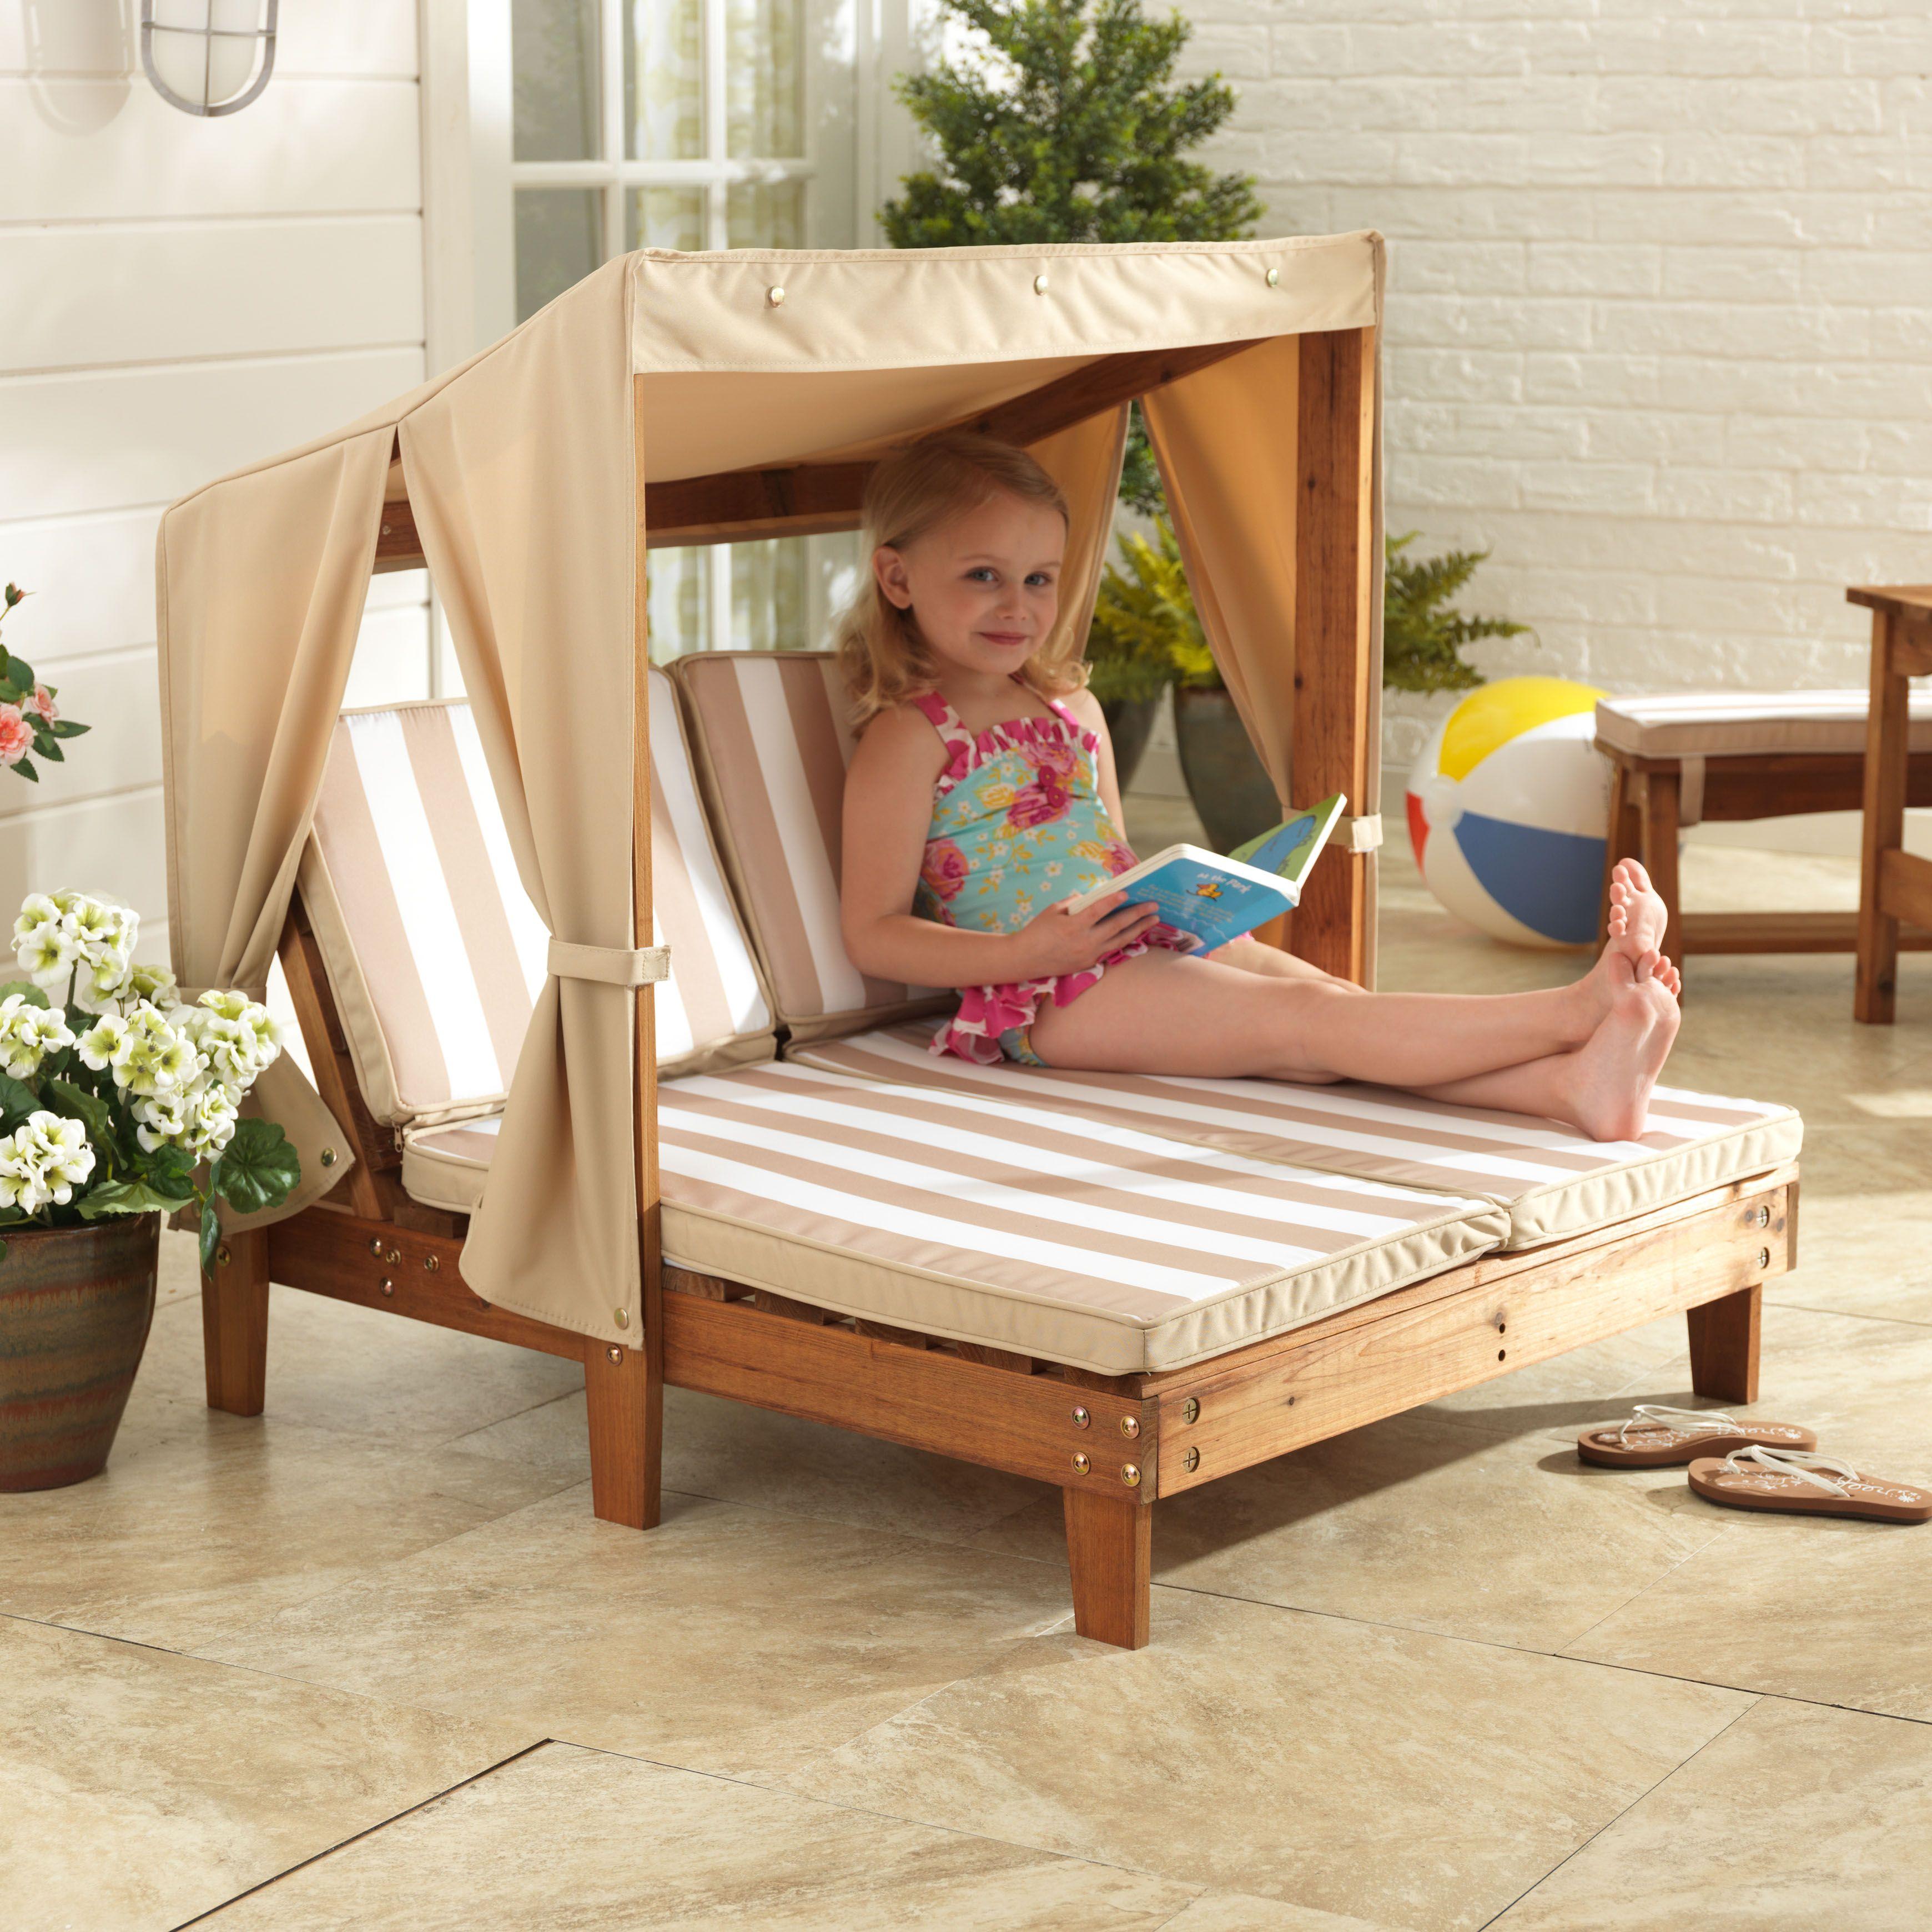 Kidkraft double chaise in oatmeal white stripes kids